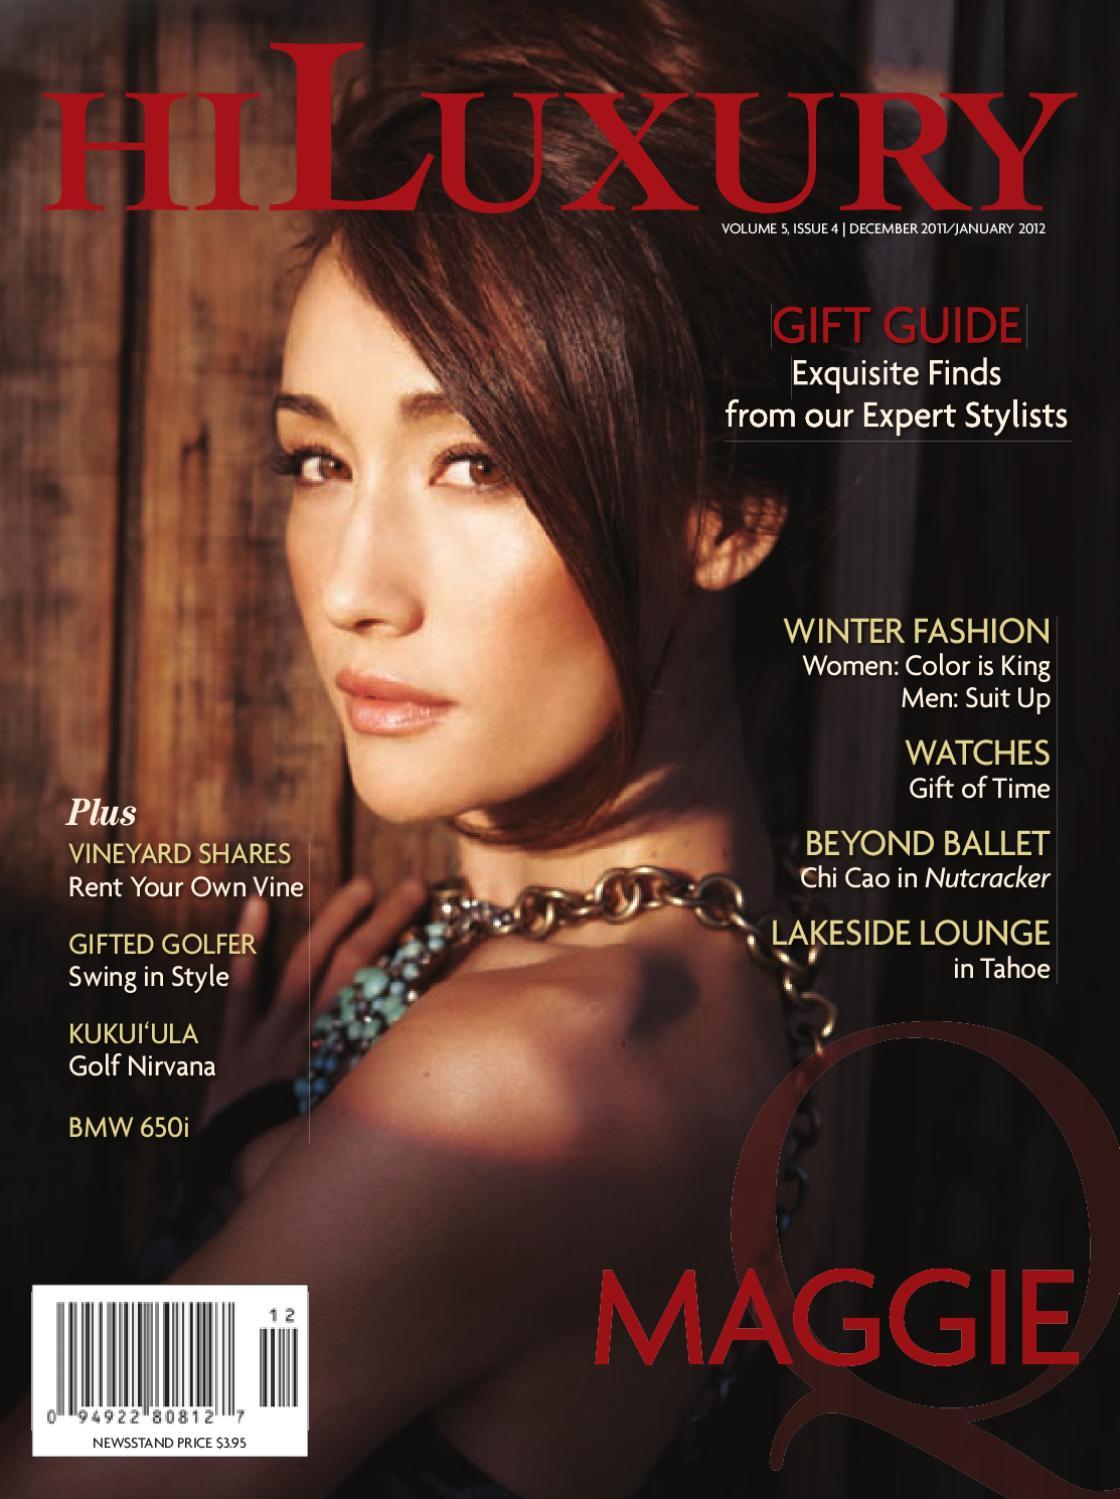 4891b84d862f HILuxury Magazine  December 2011 - January 2012 by Oahu Publications ...